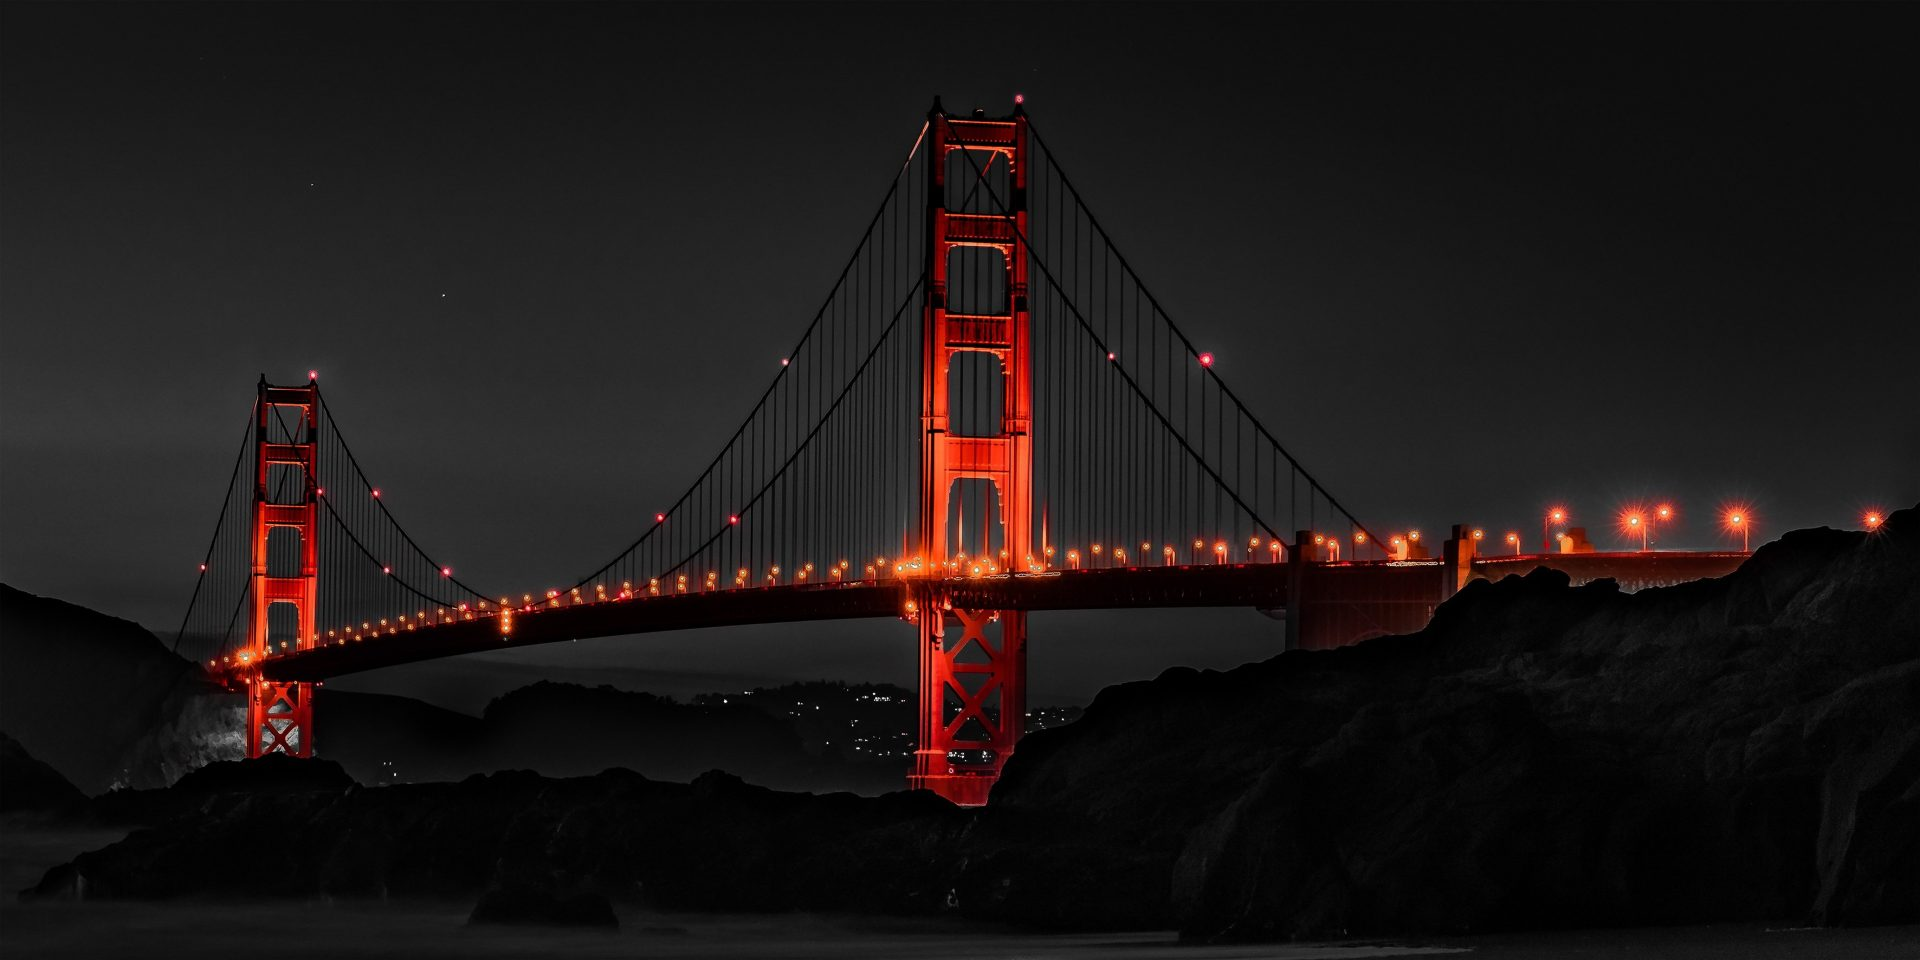 The Golden Gate Bridge in San Francisco, California - VeteranCarDonations.org